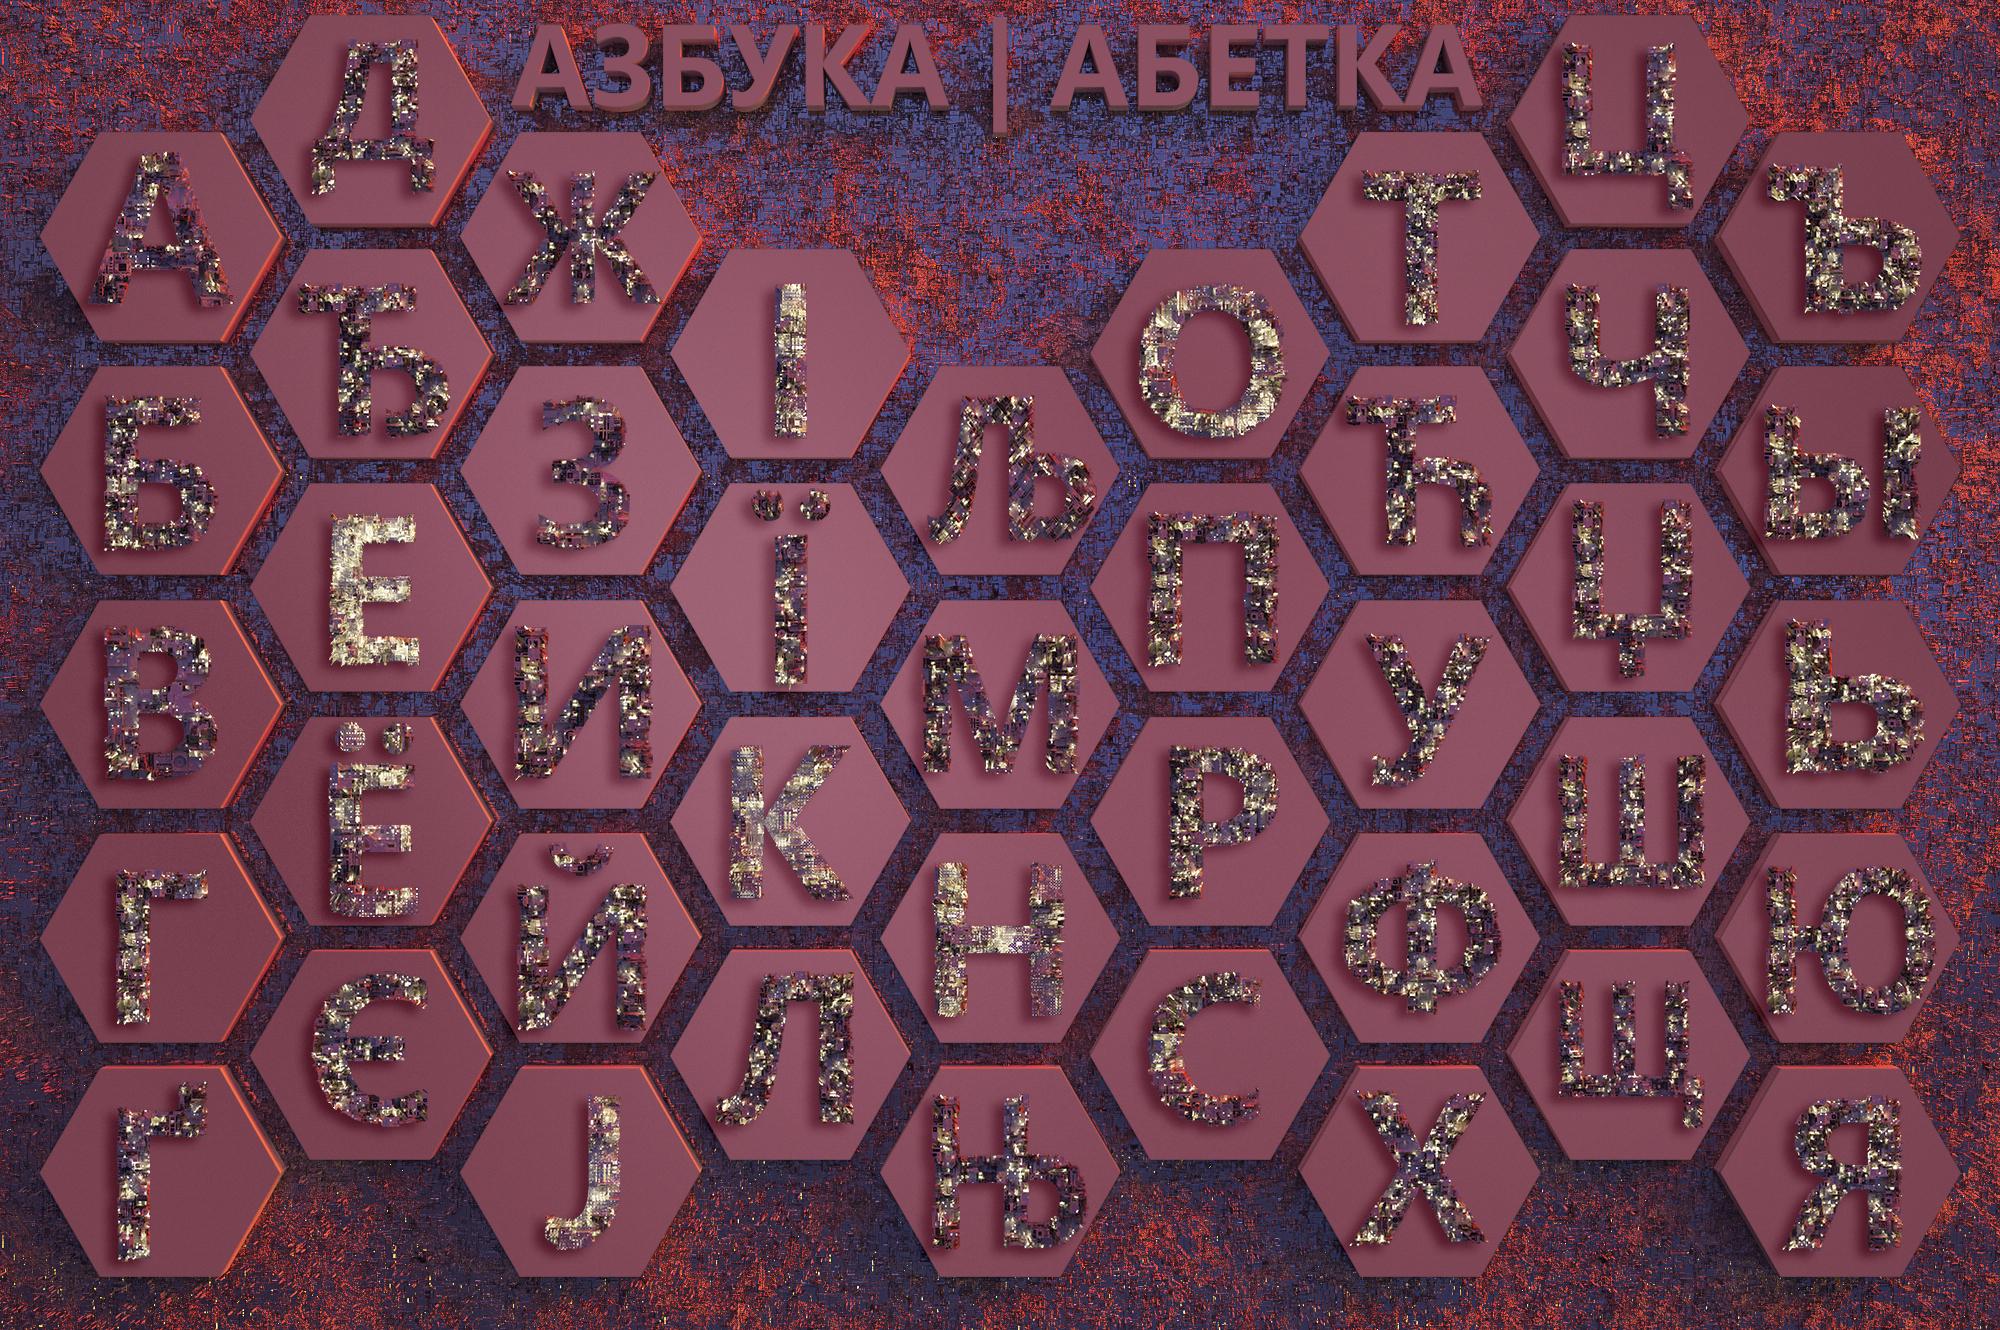 Microchip | Azbuka | Alphabet example image 5